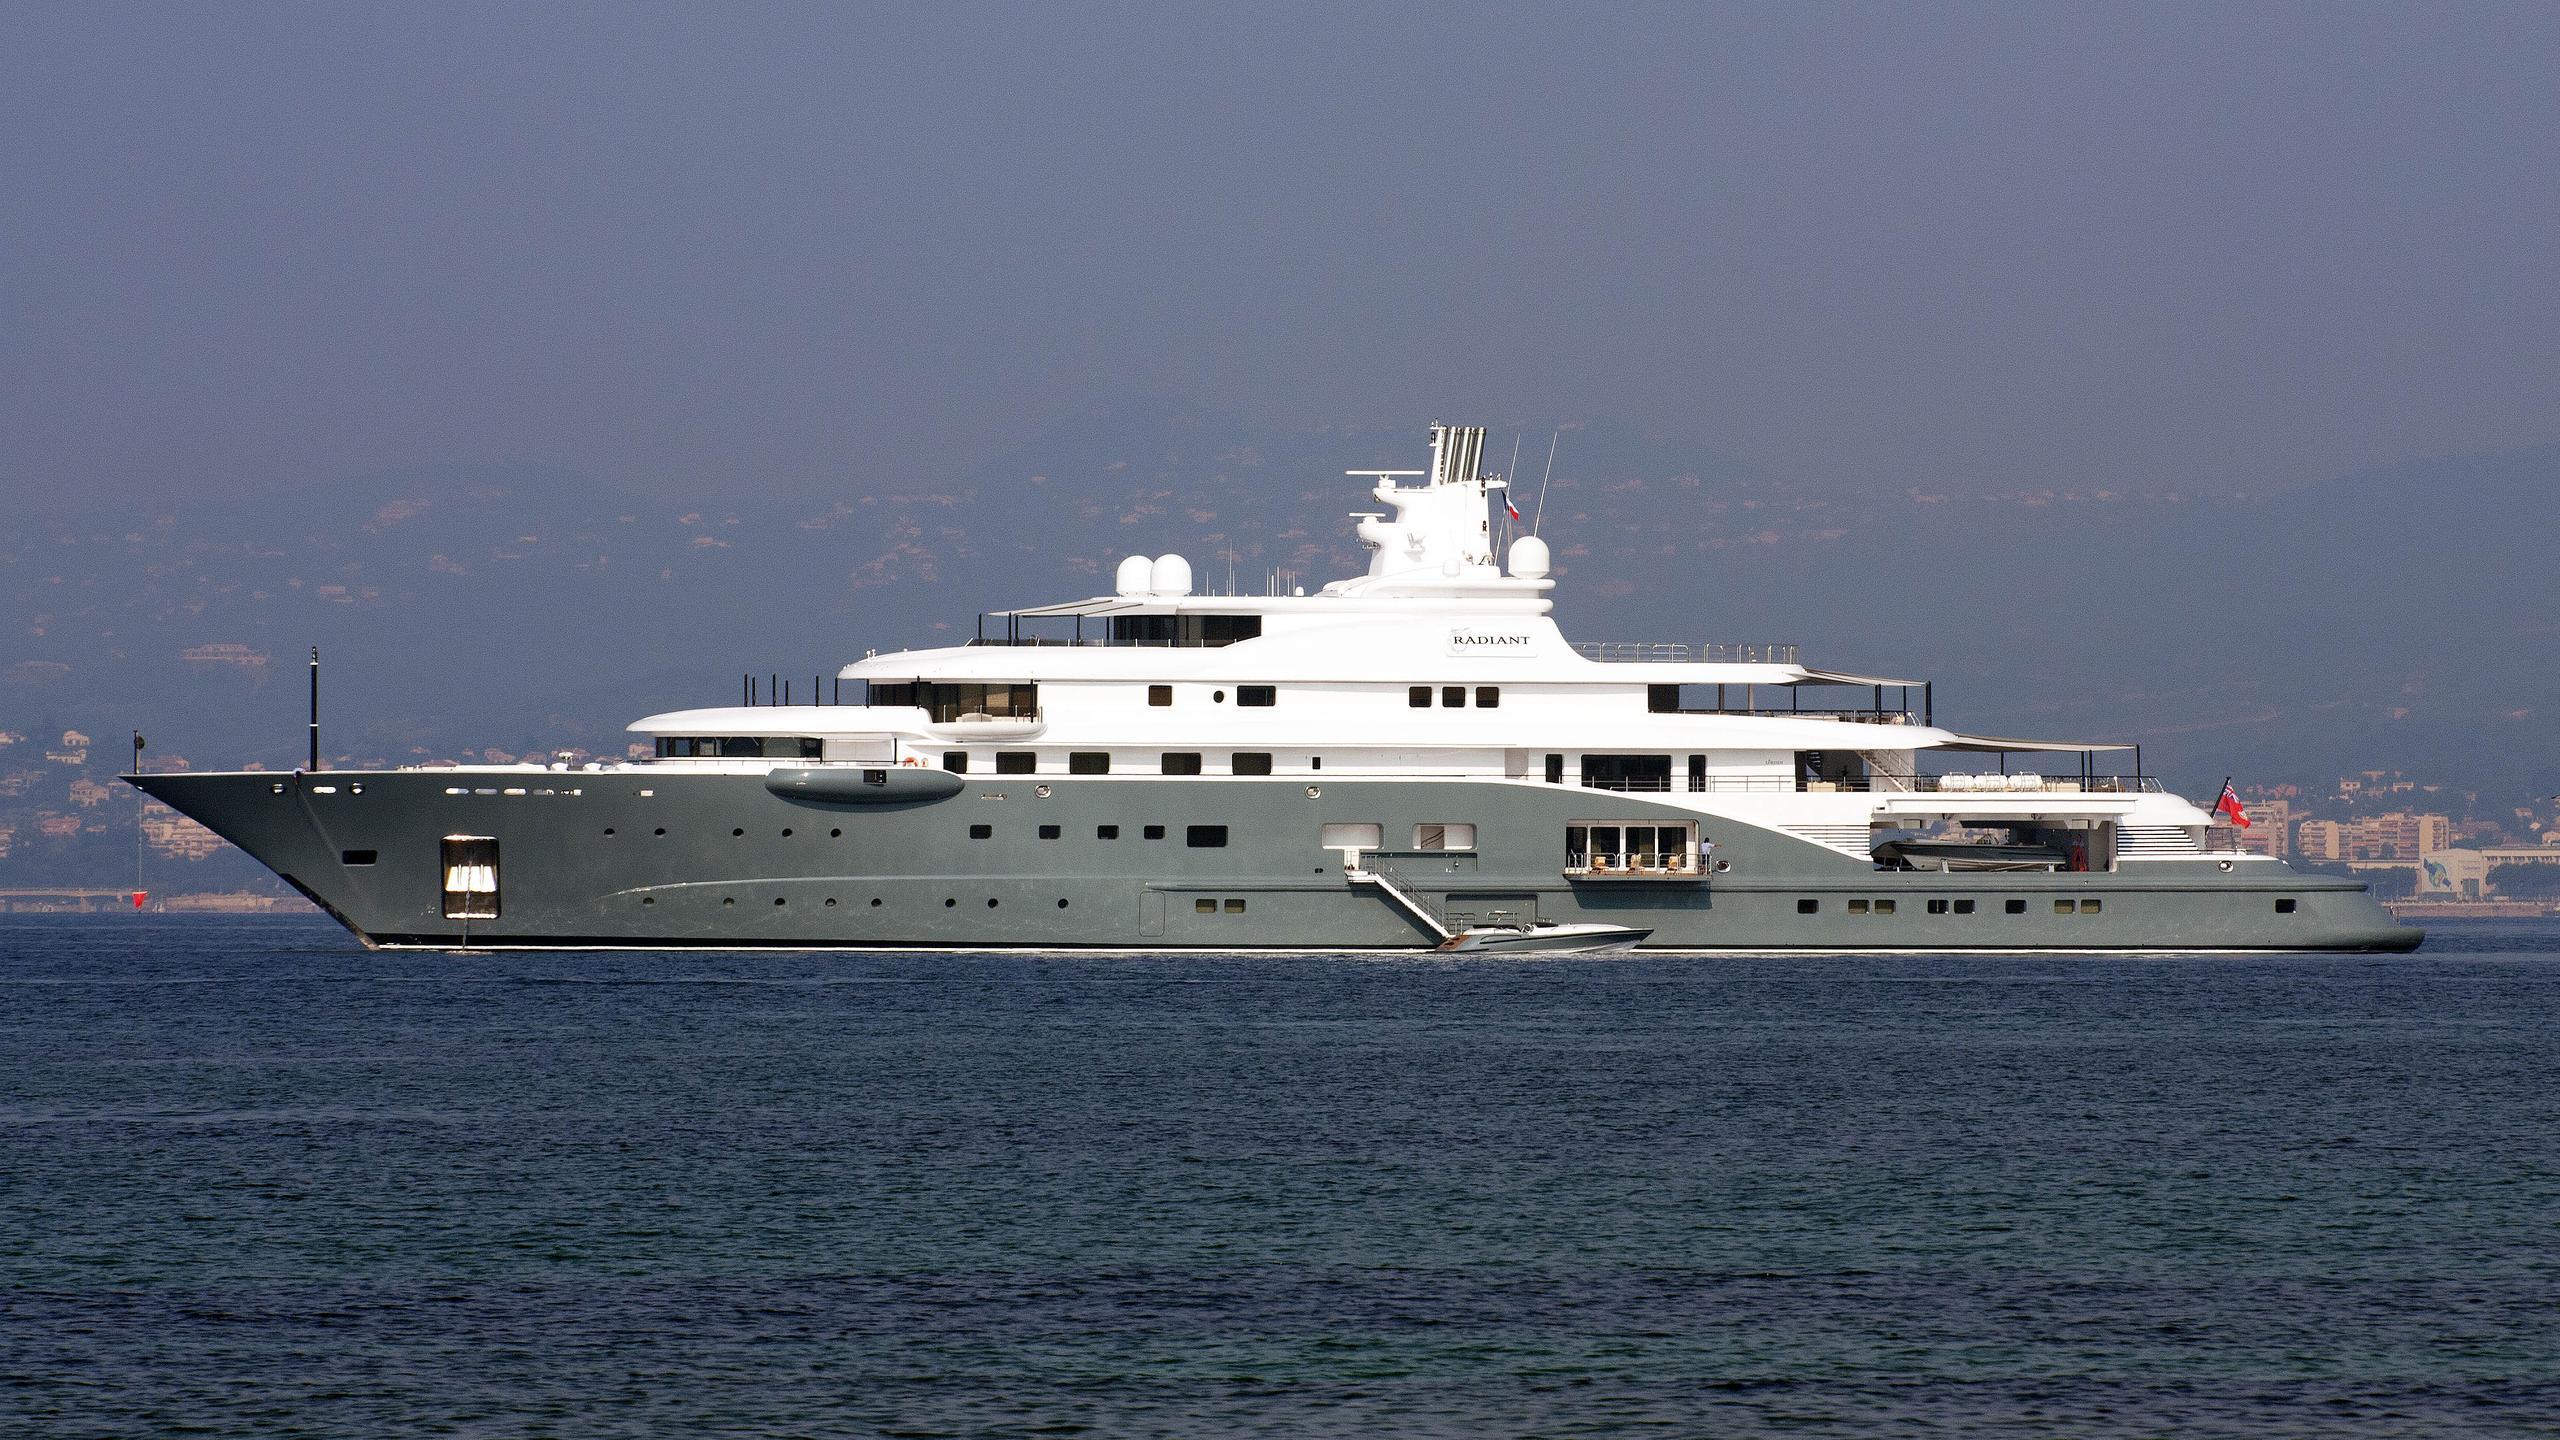 radiant-motor-yacht-lurssen-2009-110m-profile